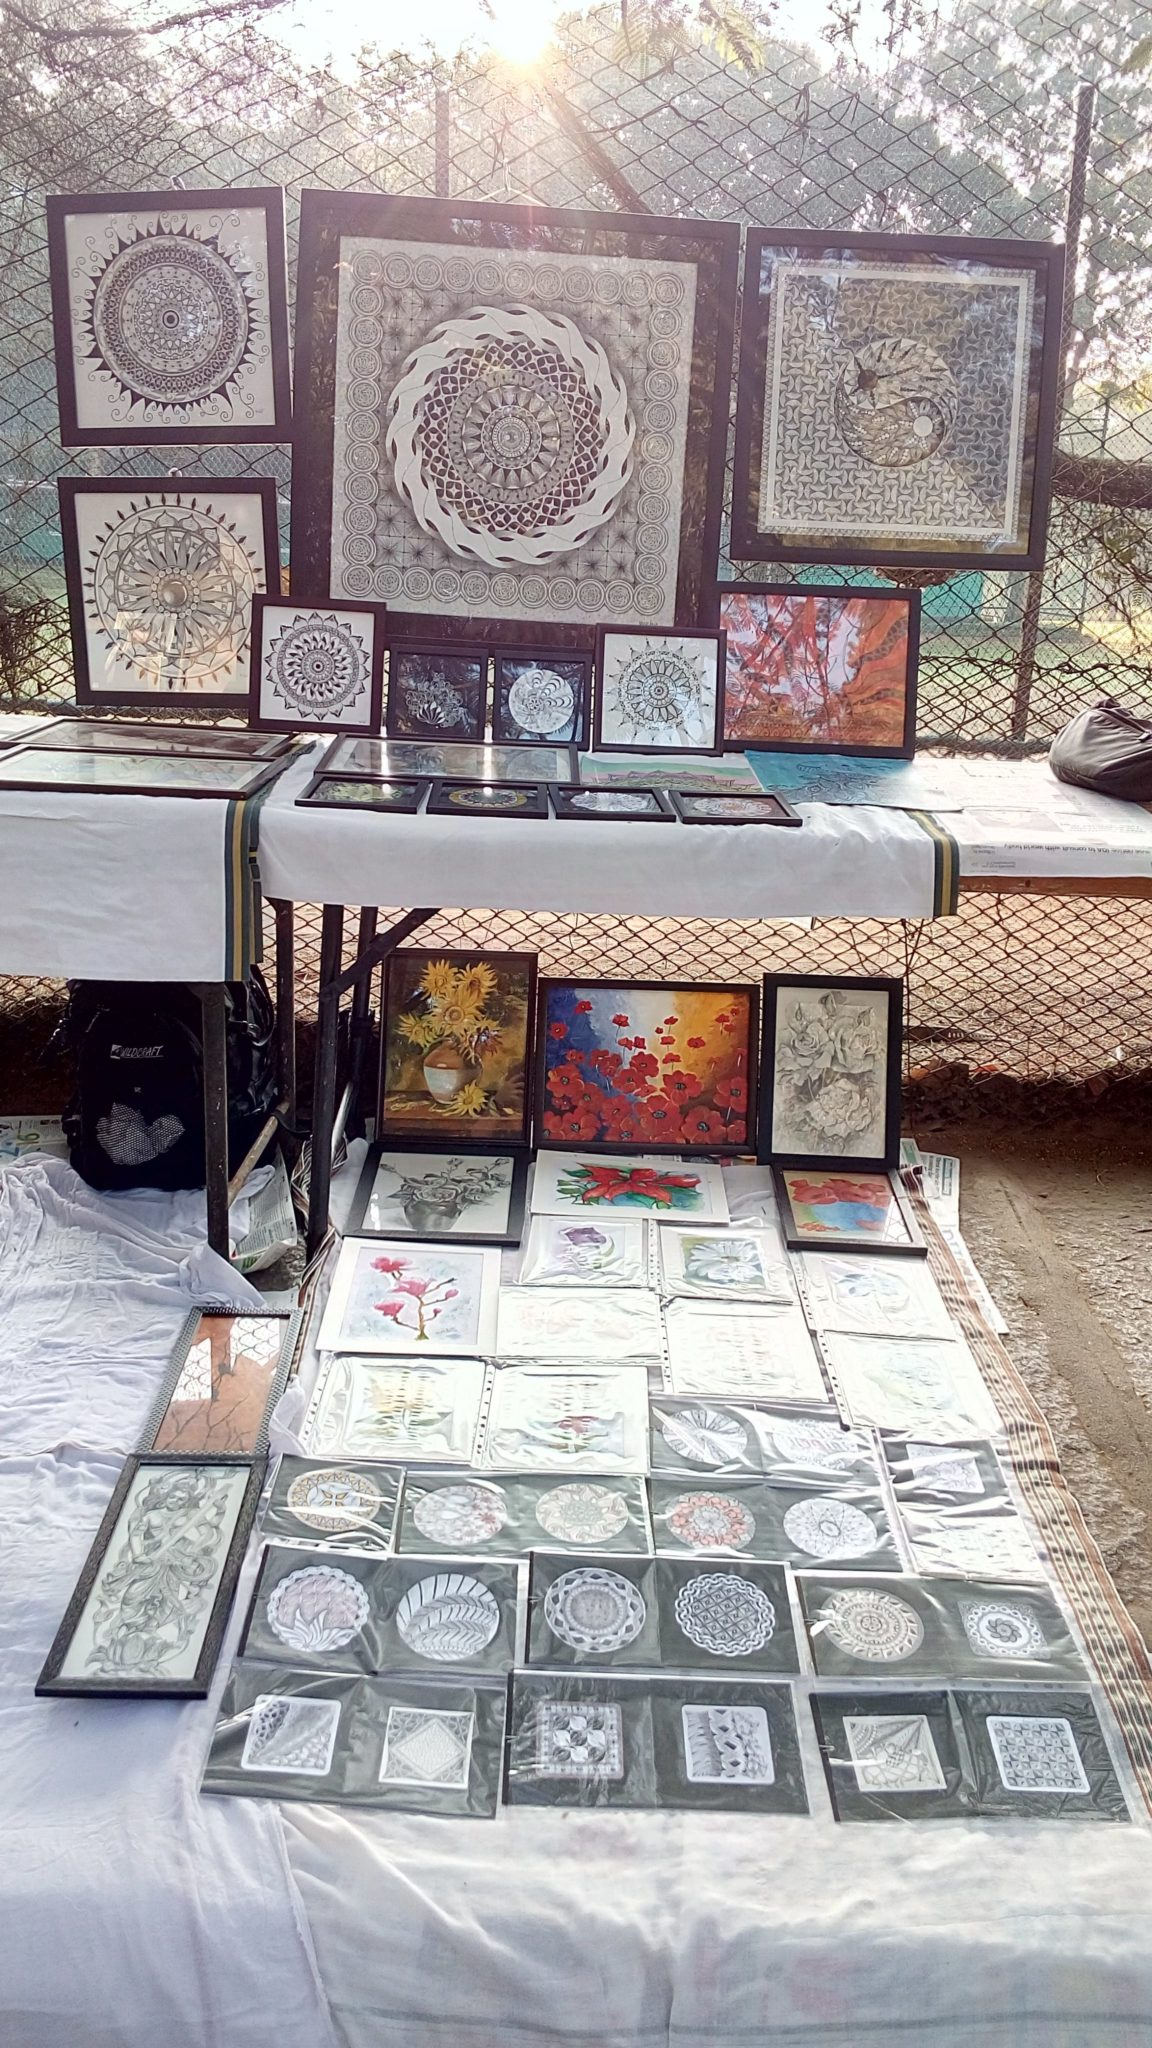 Learn the art of Zentangle!